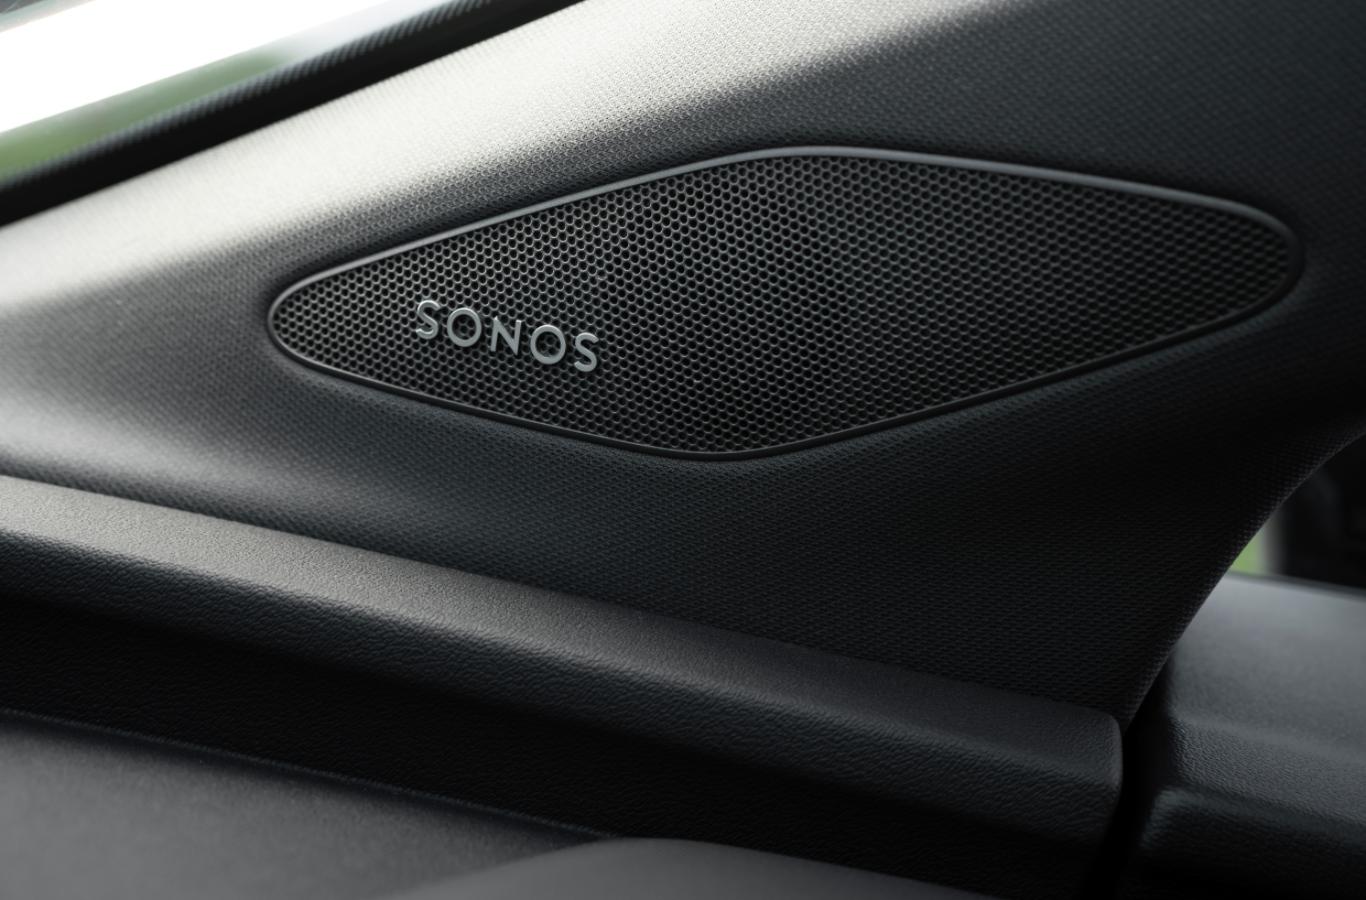 SONOS Premium Sound System